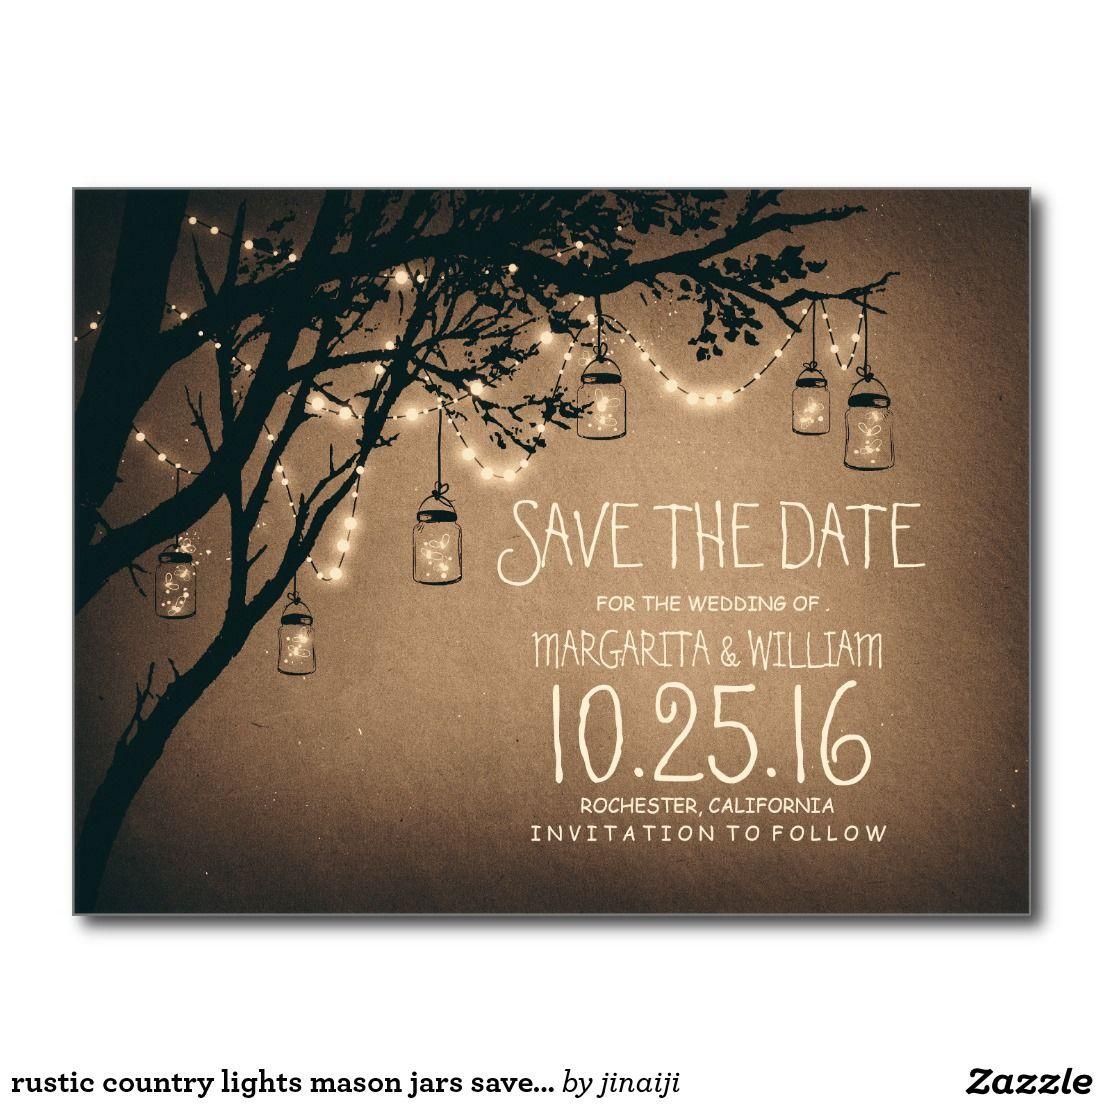 Rustic country lights mason jars save the date postcard | Wedding ...